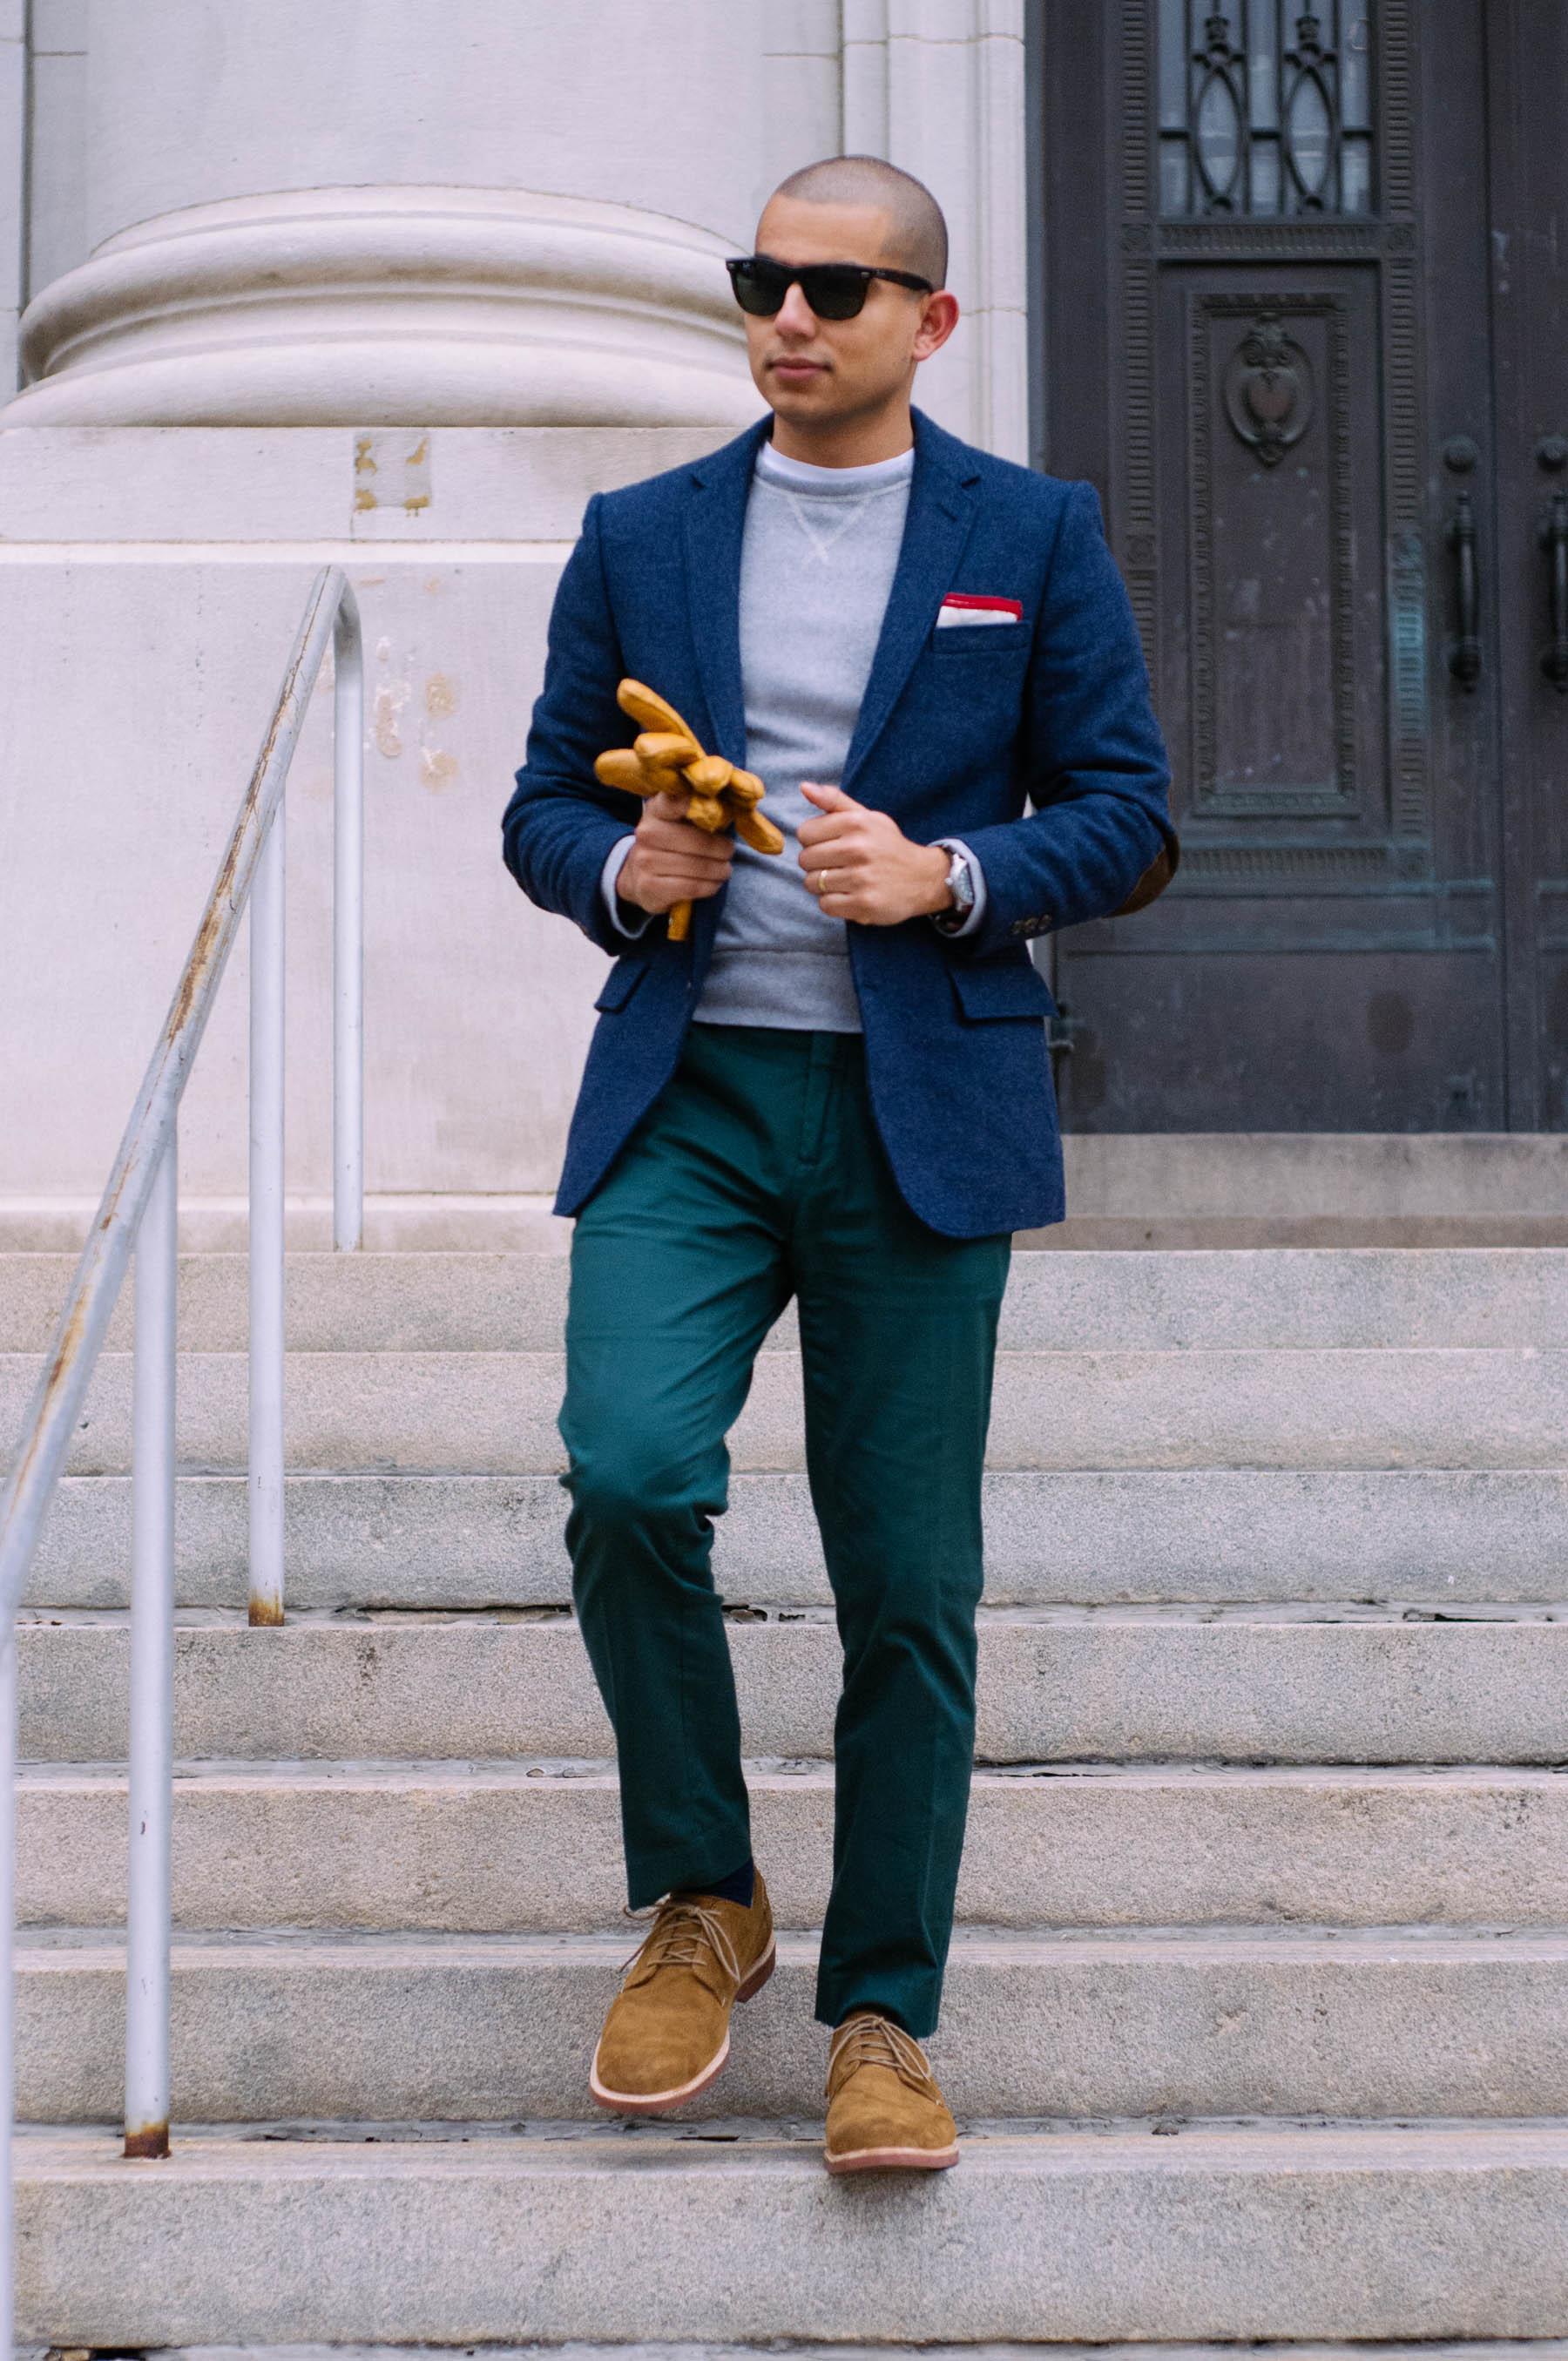 Blazer: J. Crew Factory | Pants: H&M | Sweatshirt: J.Crew | Shoes: Sperry Gold Cup | Gloves: Jack Spade | Pocket Square: The Tie Bar | Watch: Aeromatic 1912 | Sunglasses: RayBan